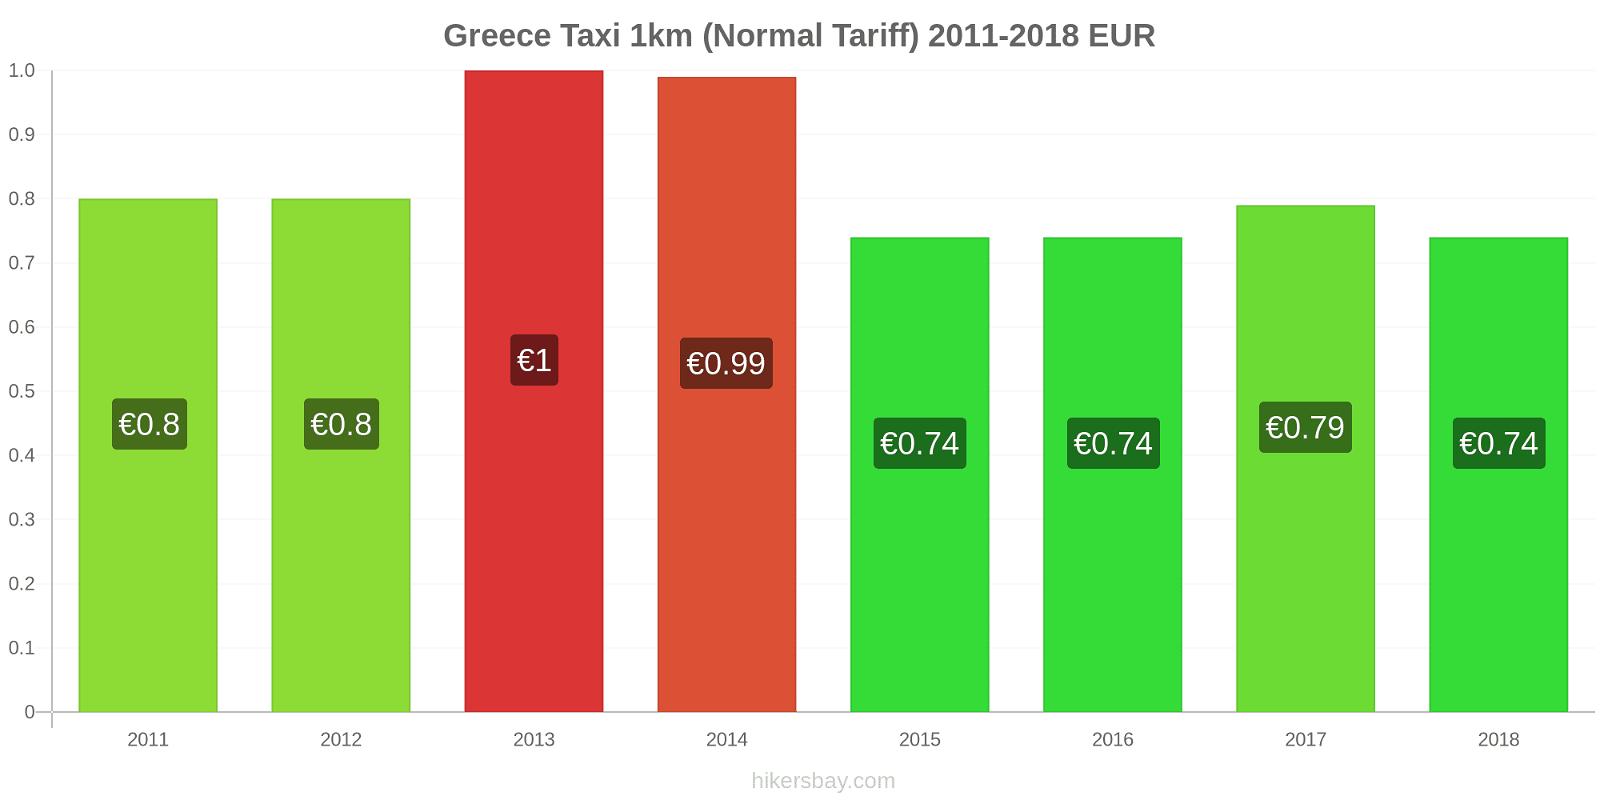 Greece price changes Taxi 1km (Normal Tariff) hikersbay.com